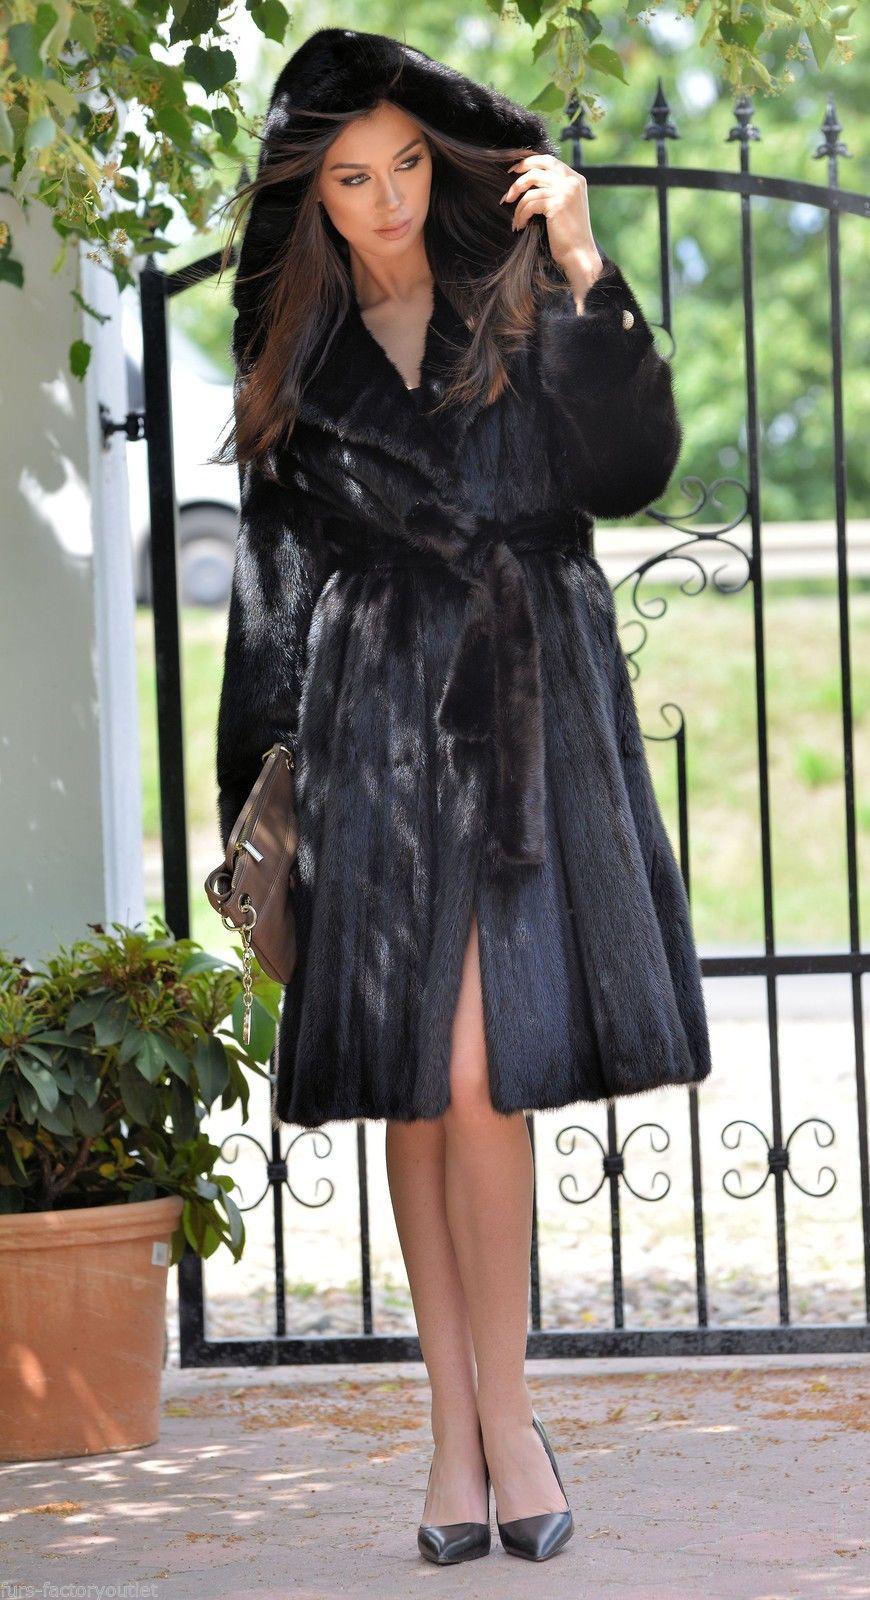 Pin By Robert Vitaglione On Fur Site 94 Fur Street Style Fur Coats Women Fashion